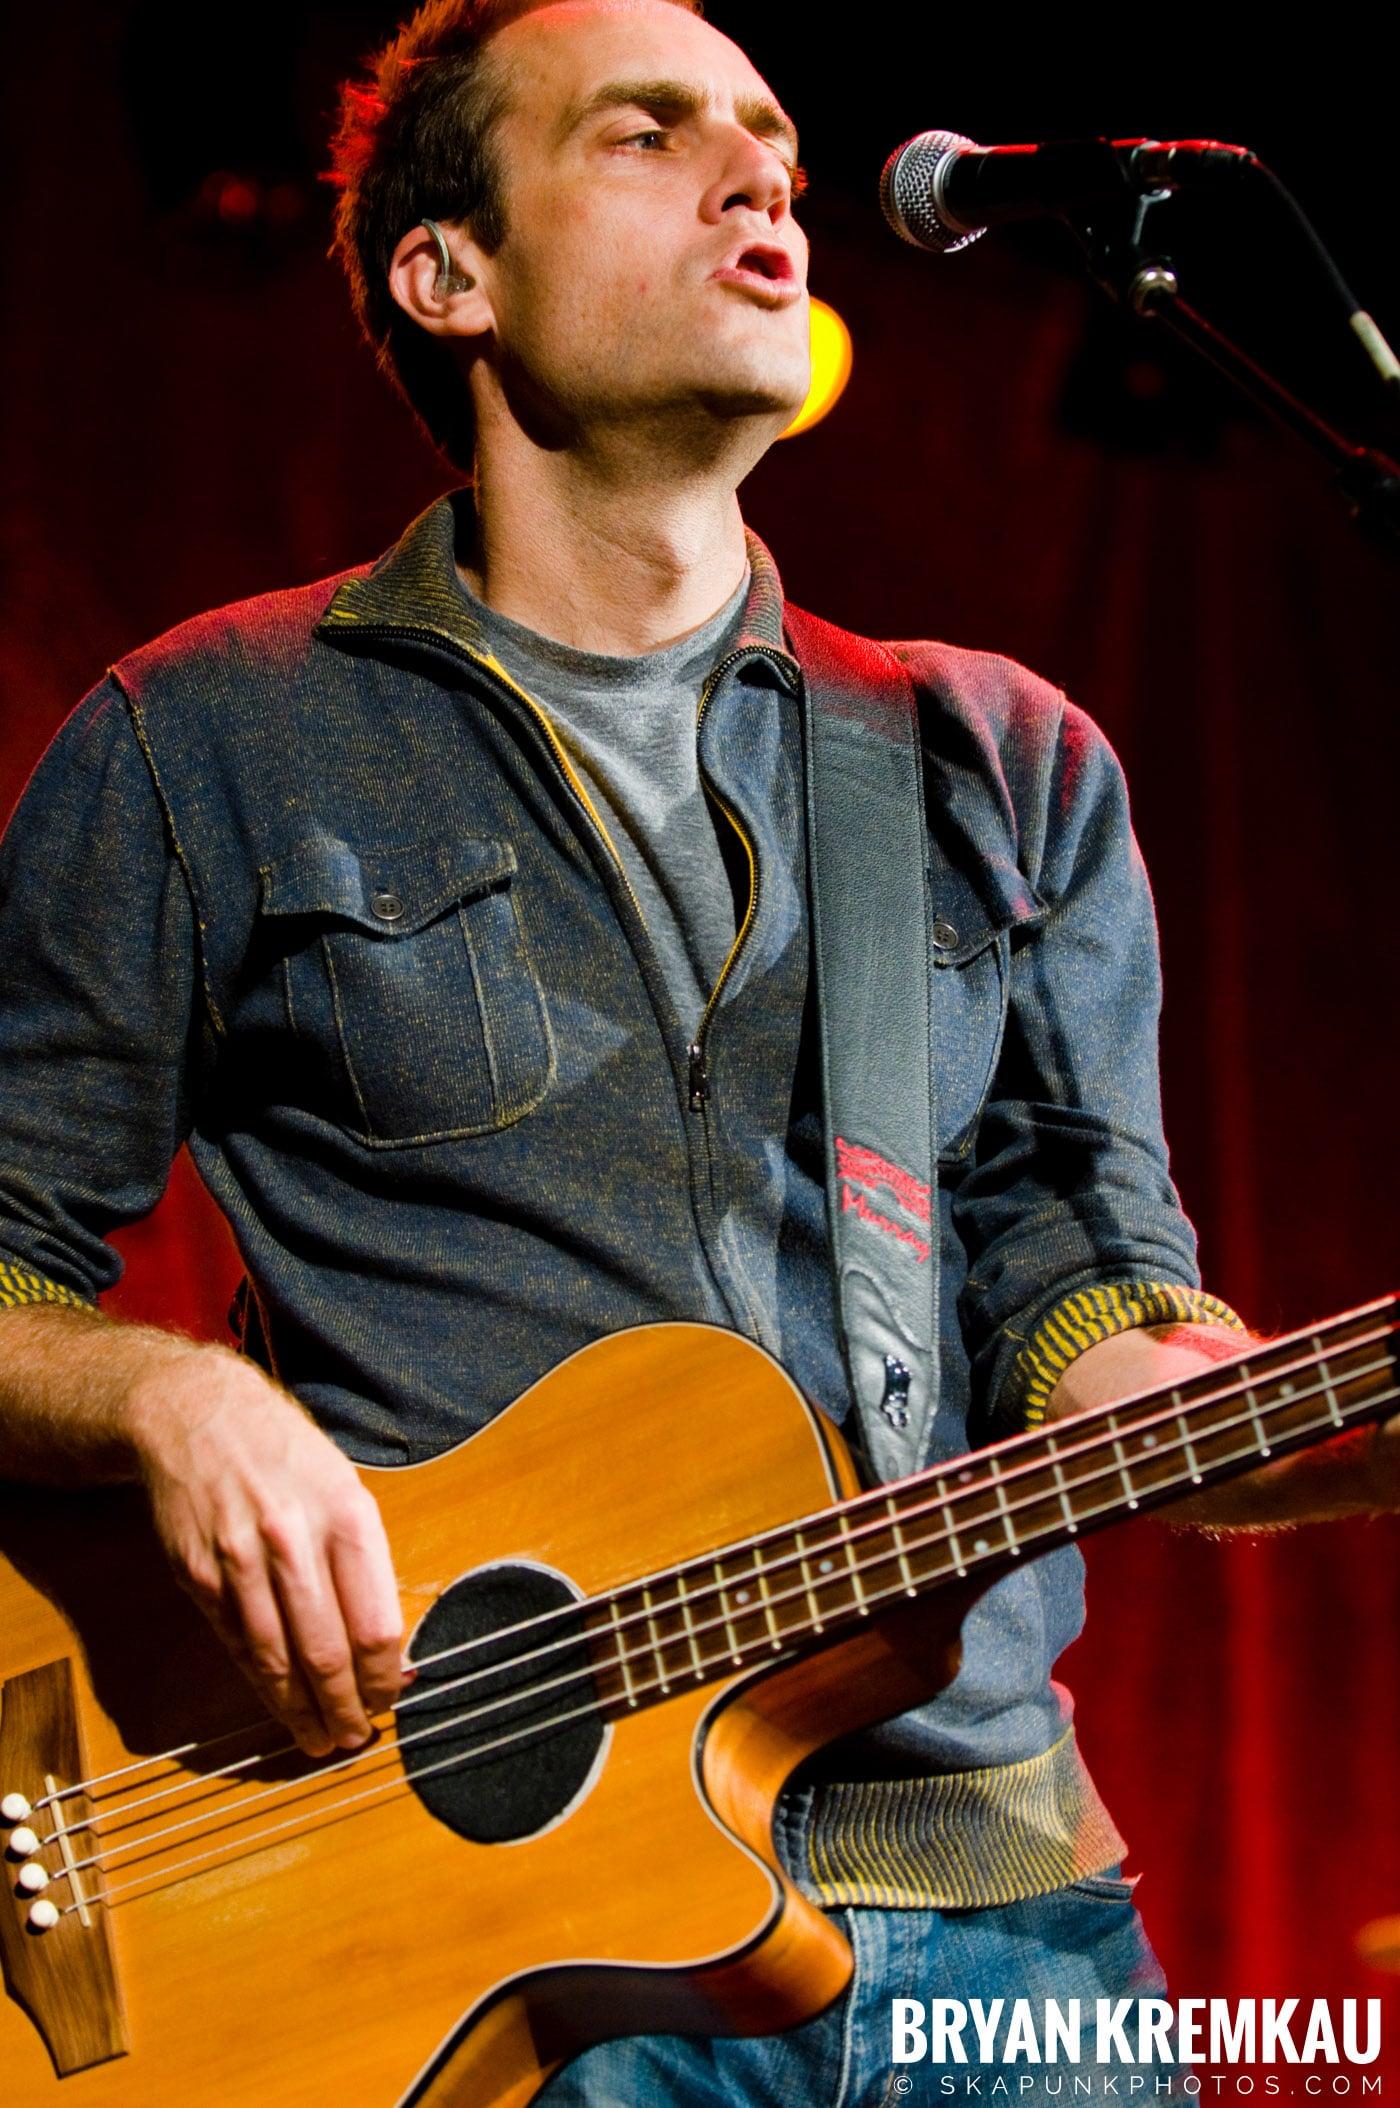 Great Big Sea @ Tarrytown Music Hall, Tarrytown, NY - 10.10.09 (13)